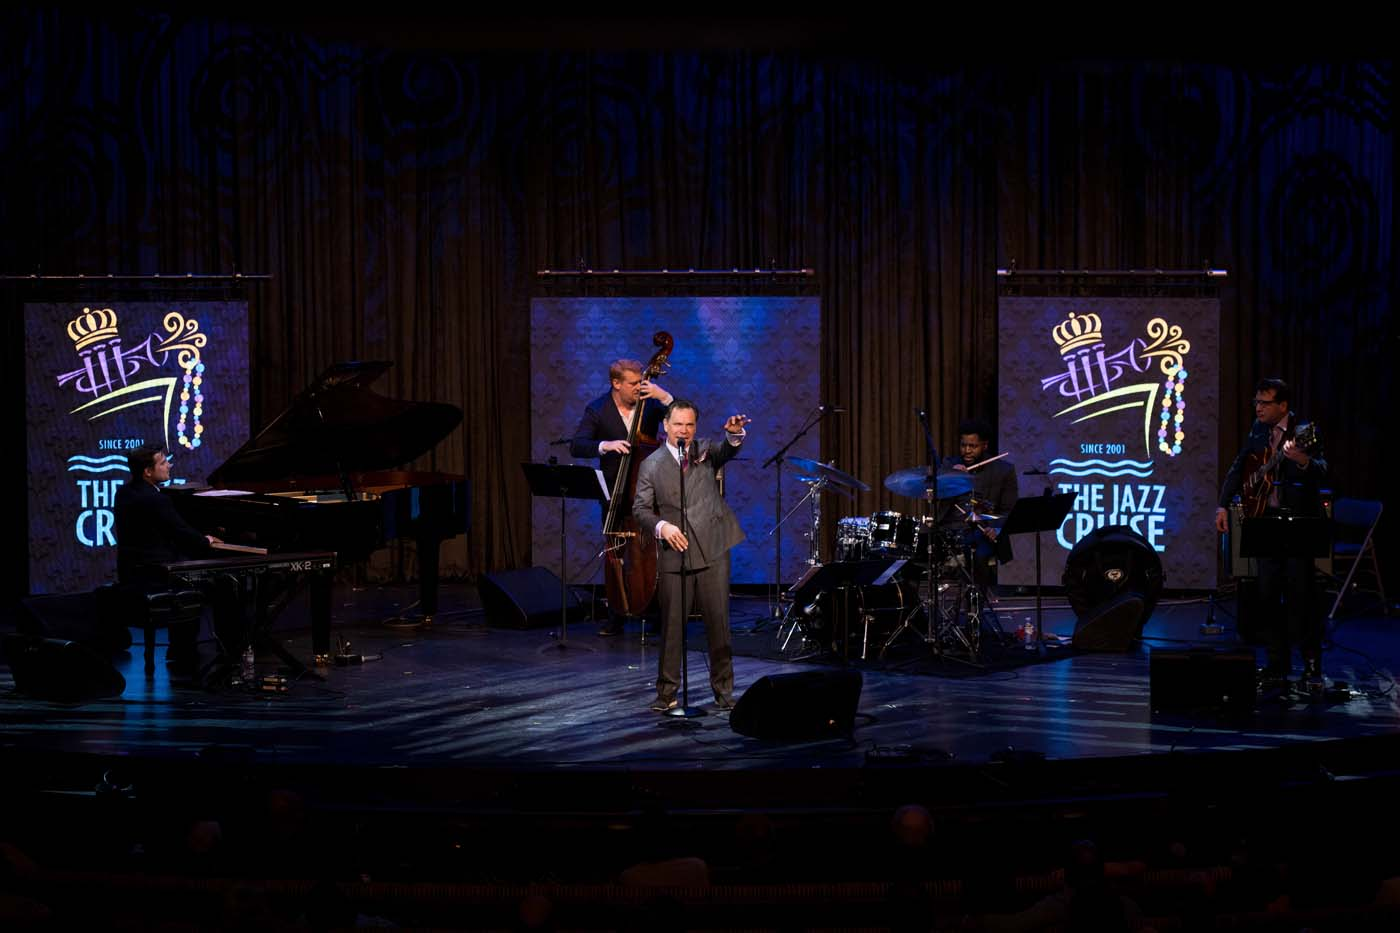 Kurt-Elling-custom-piano-service-j-elliott-co-jazz-cruise